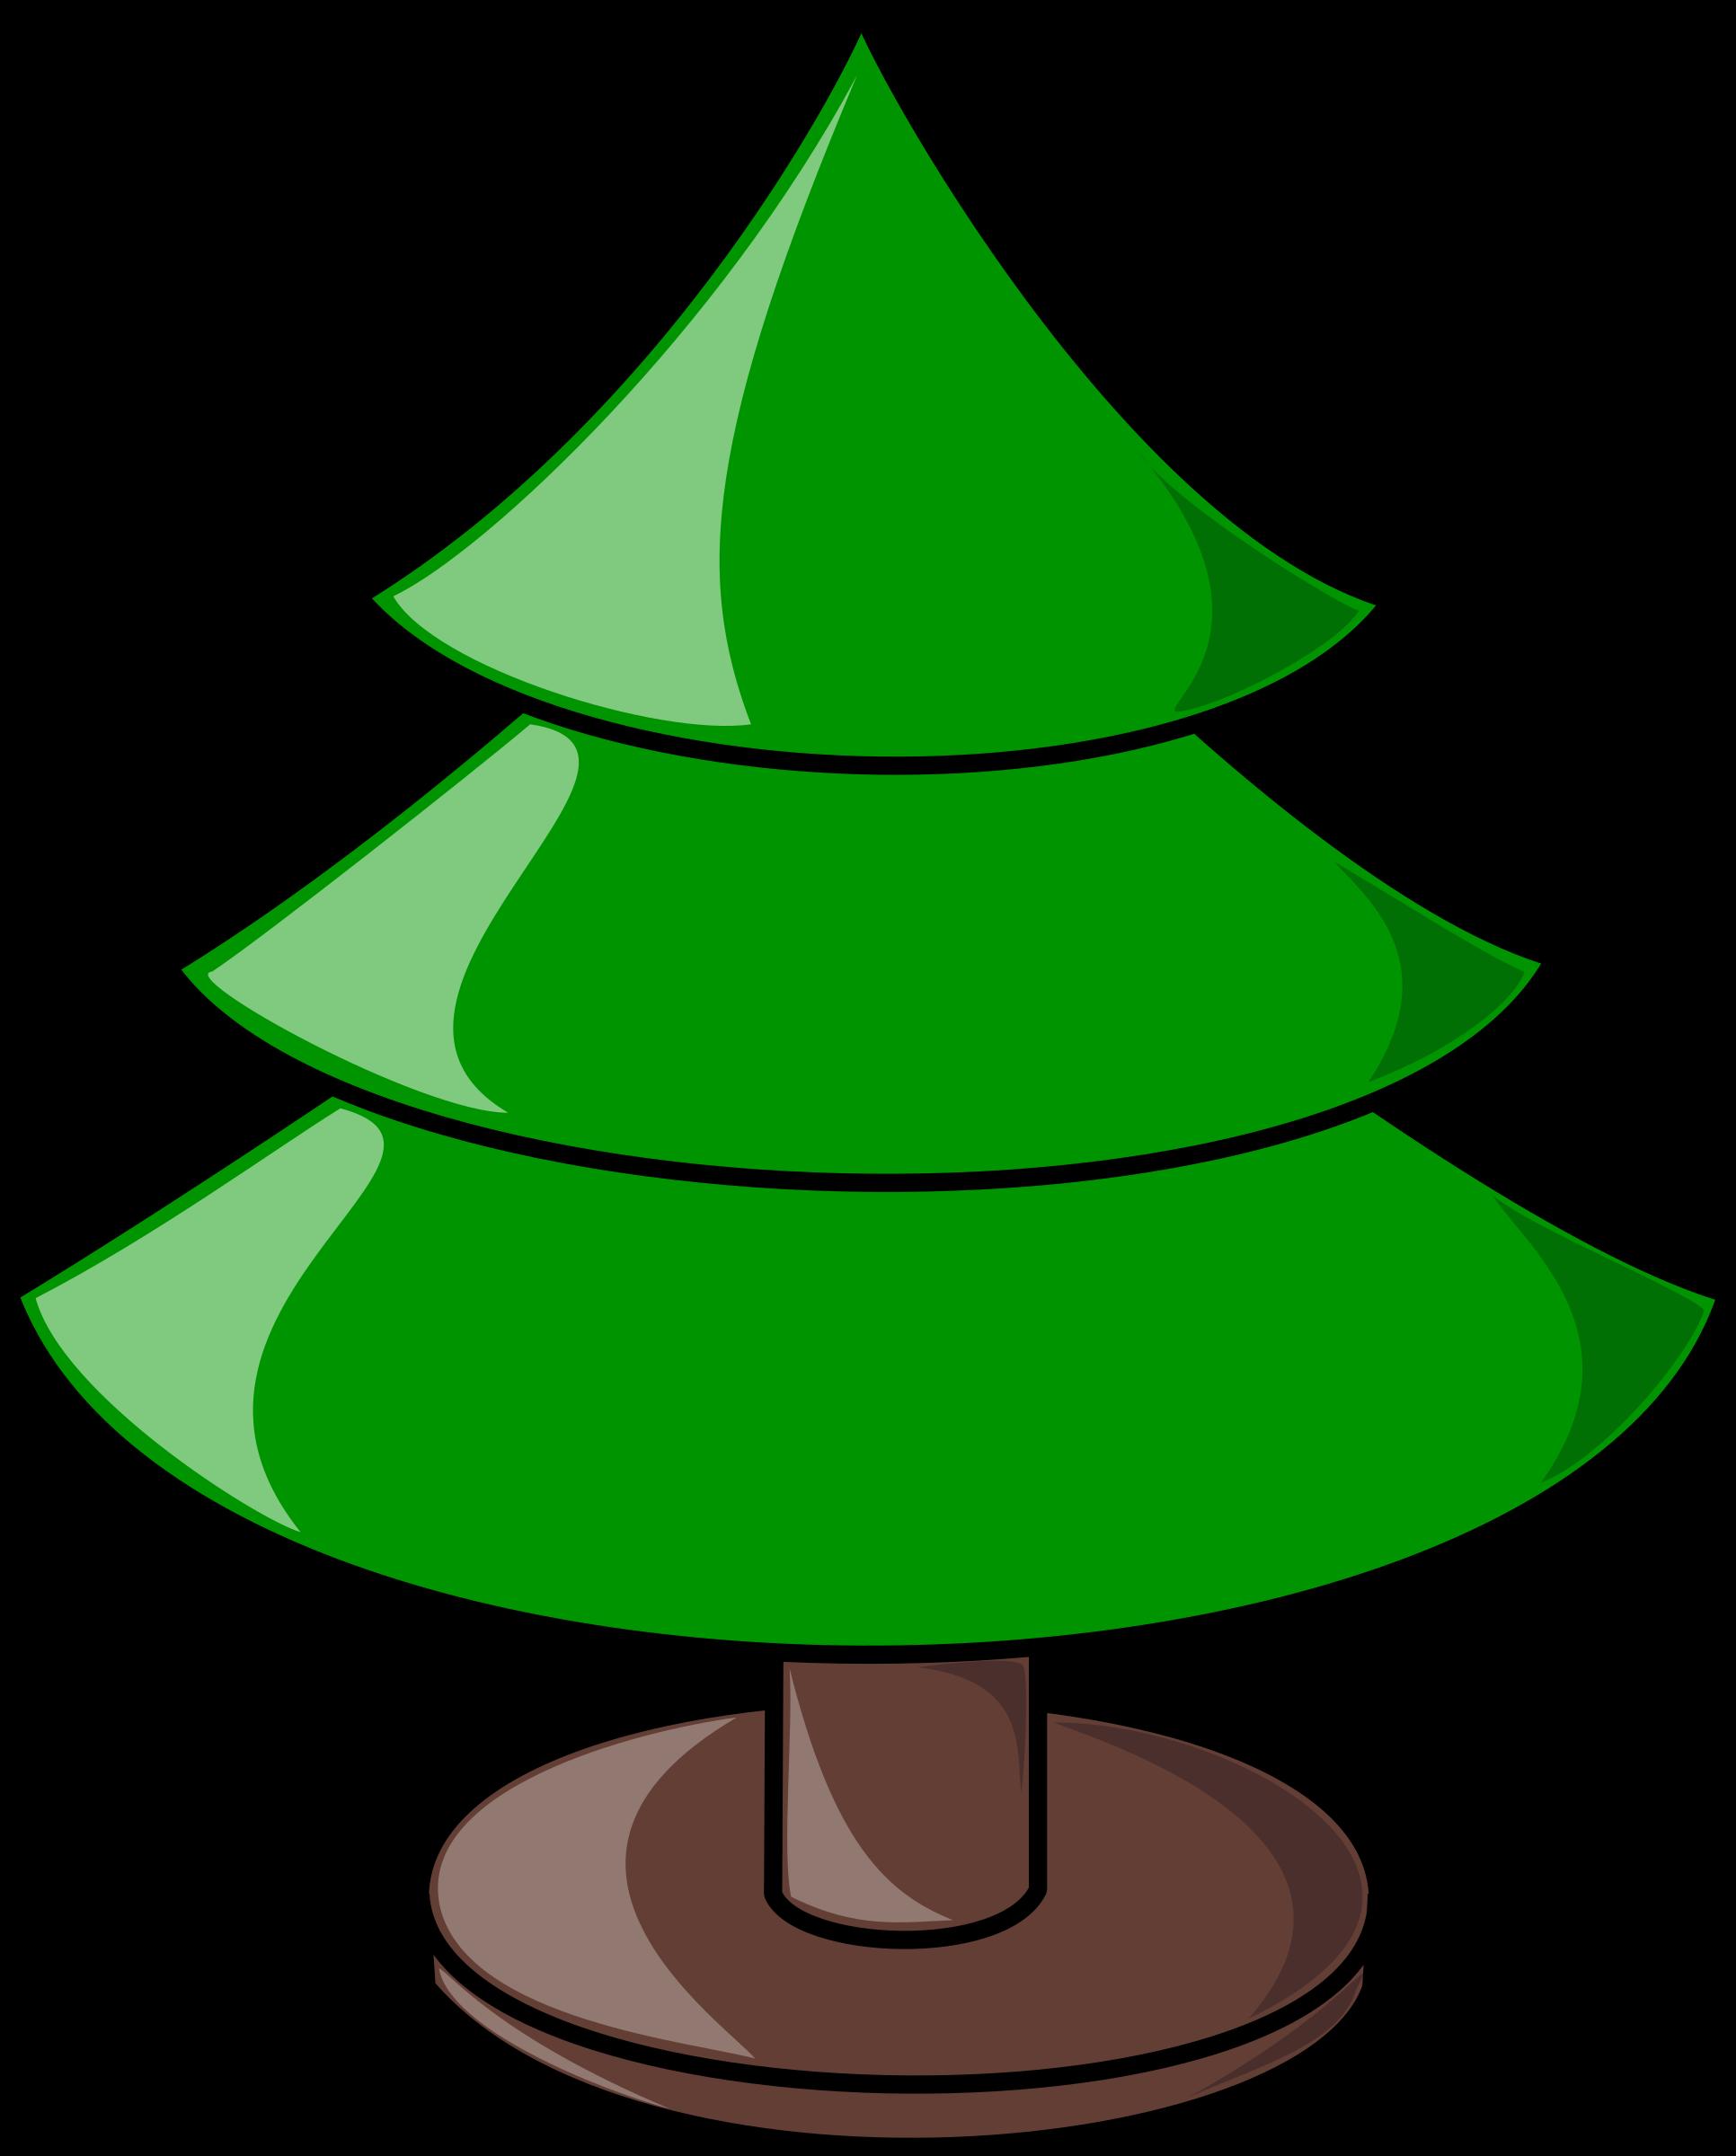 Color clipart tree. Christmas plain big image